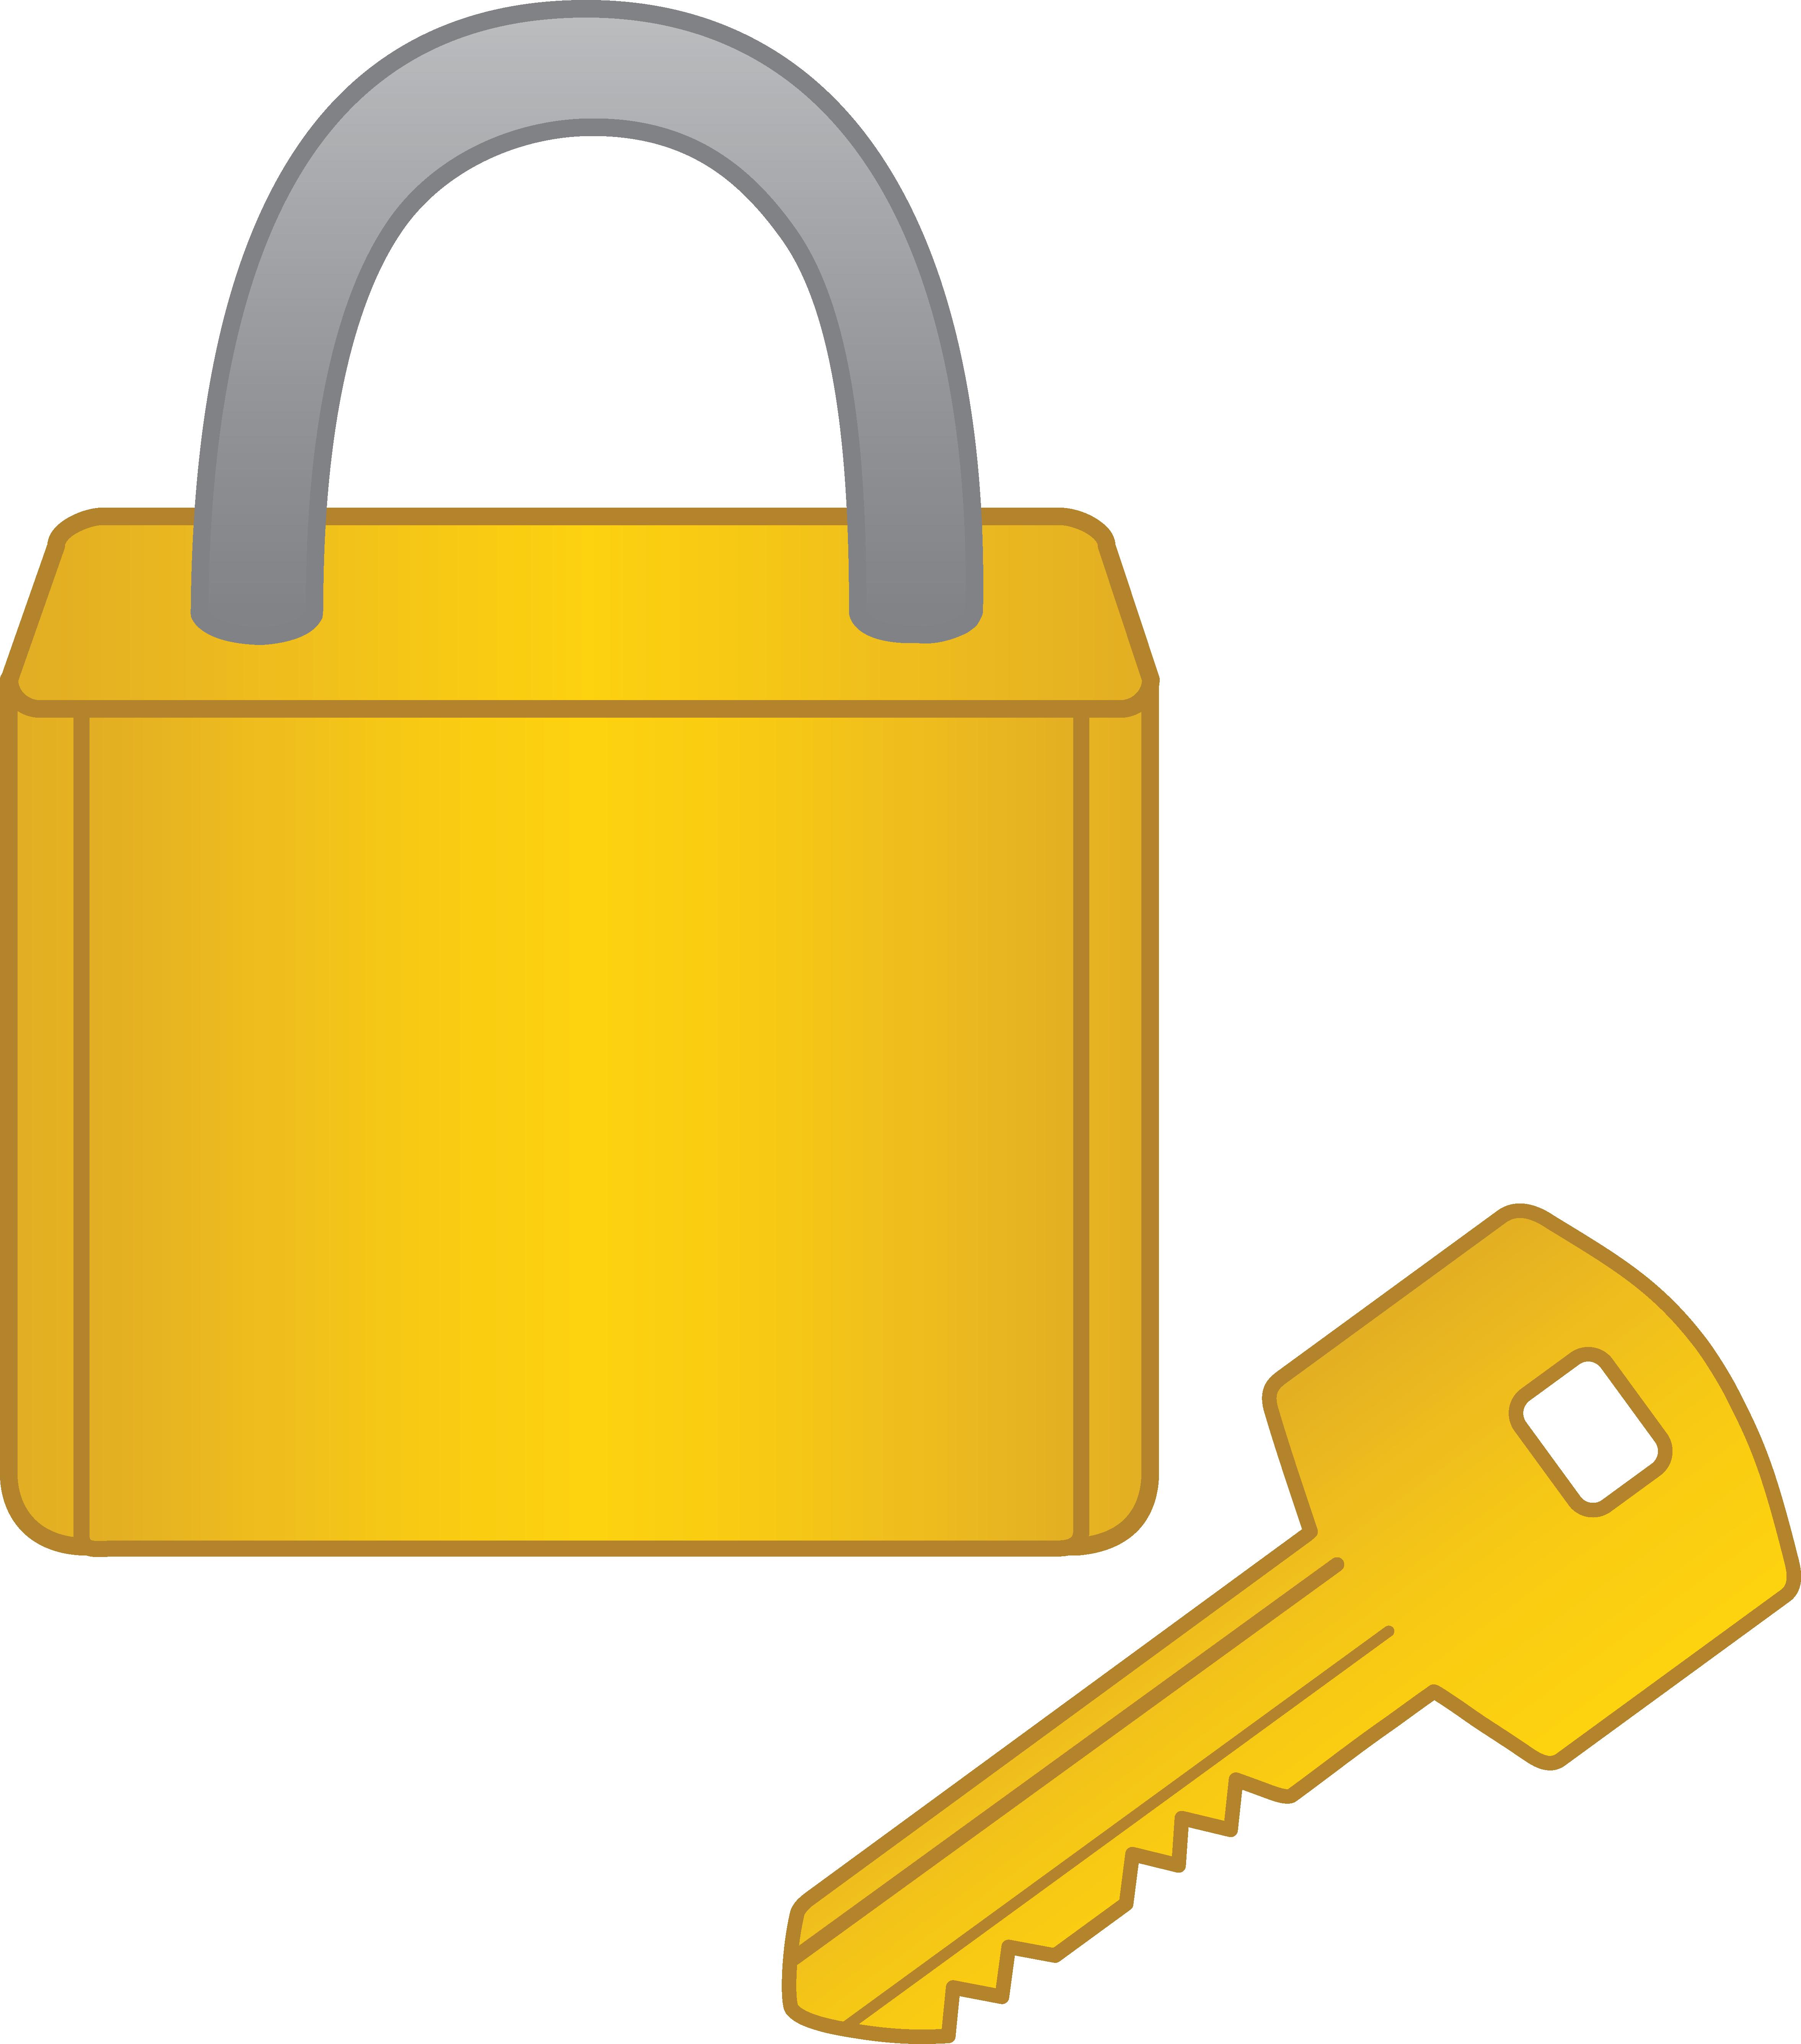 Clipart house keys jpg download Free Key Images, Download Free Clip Art, Free Clip Art on Clipart ... jpg download